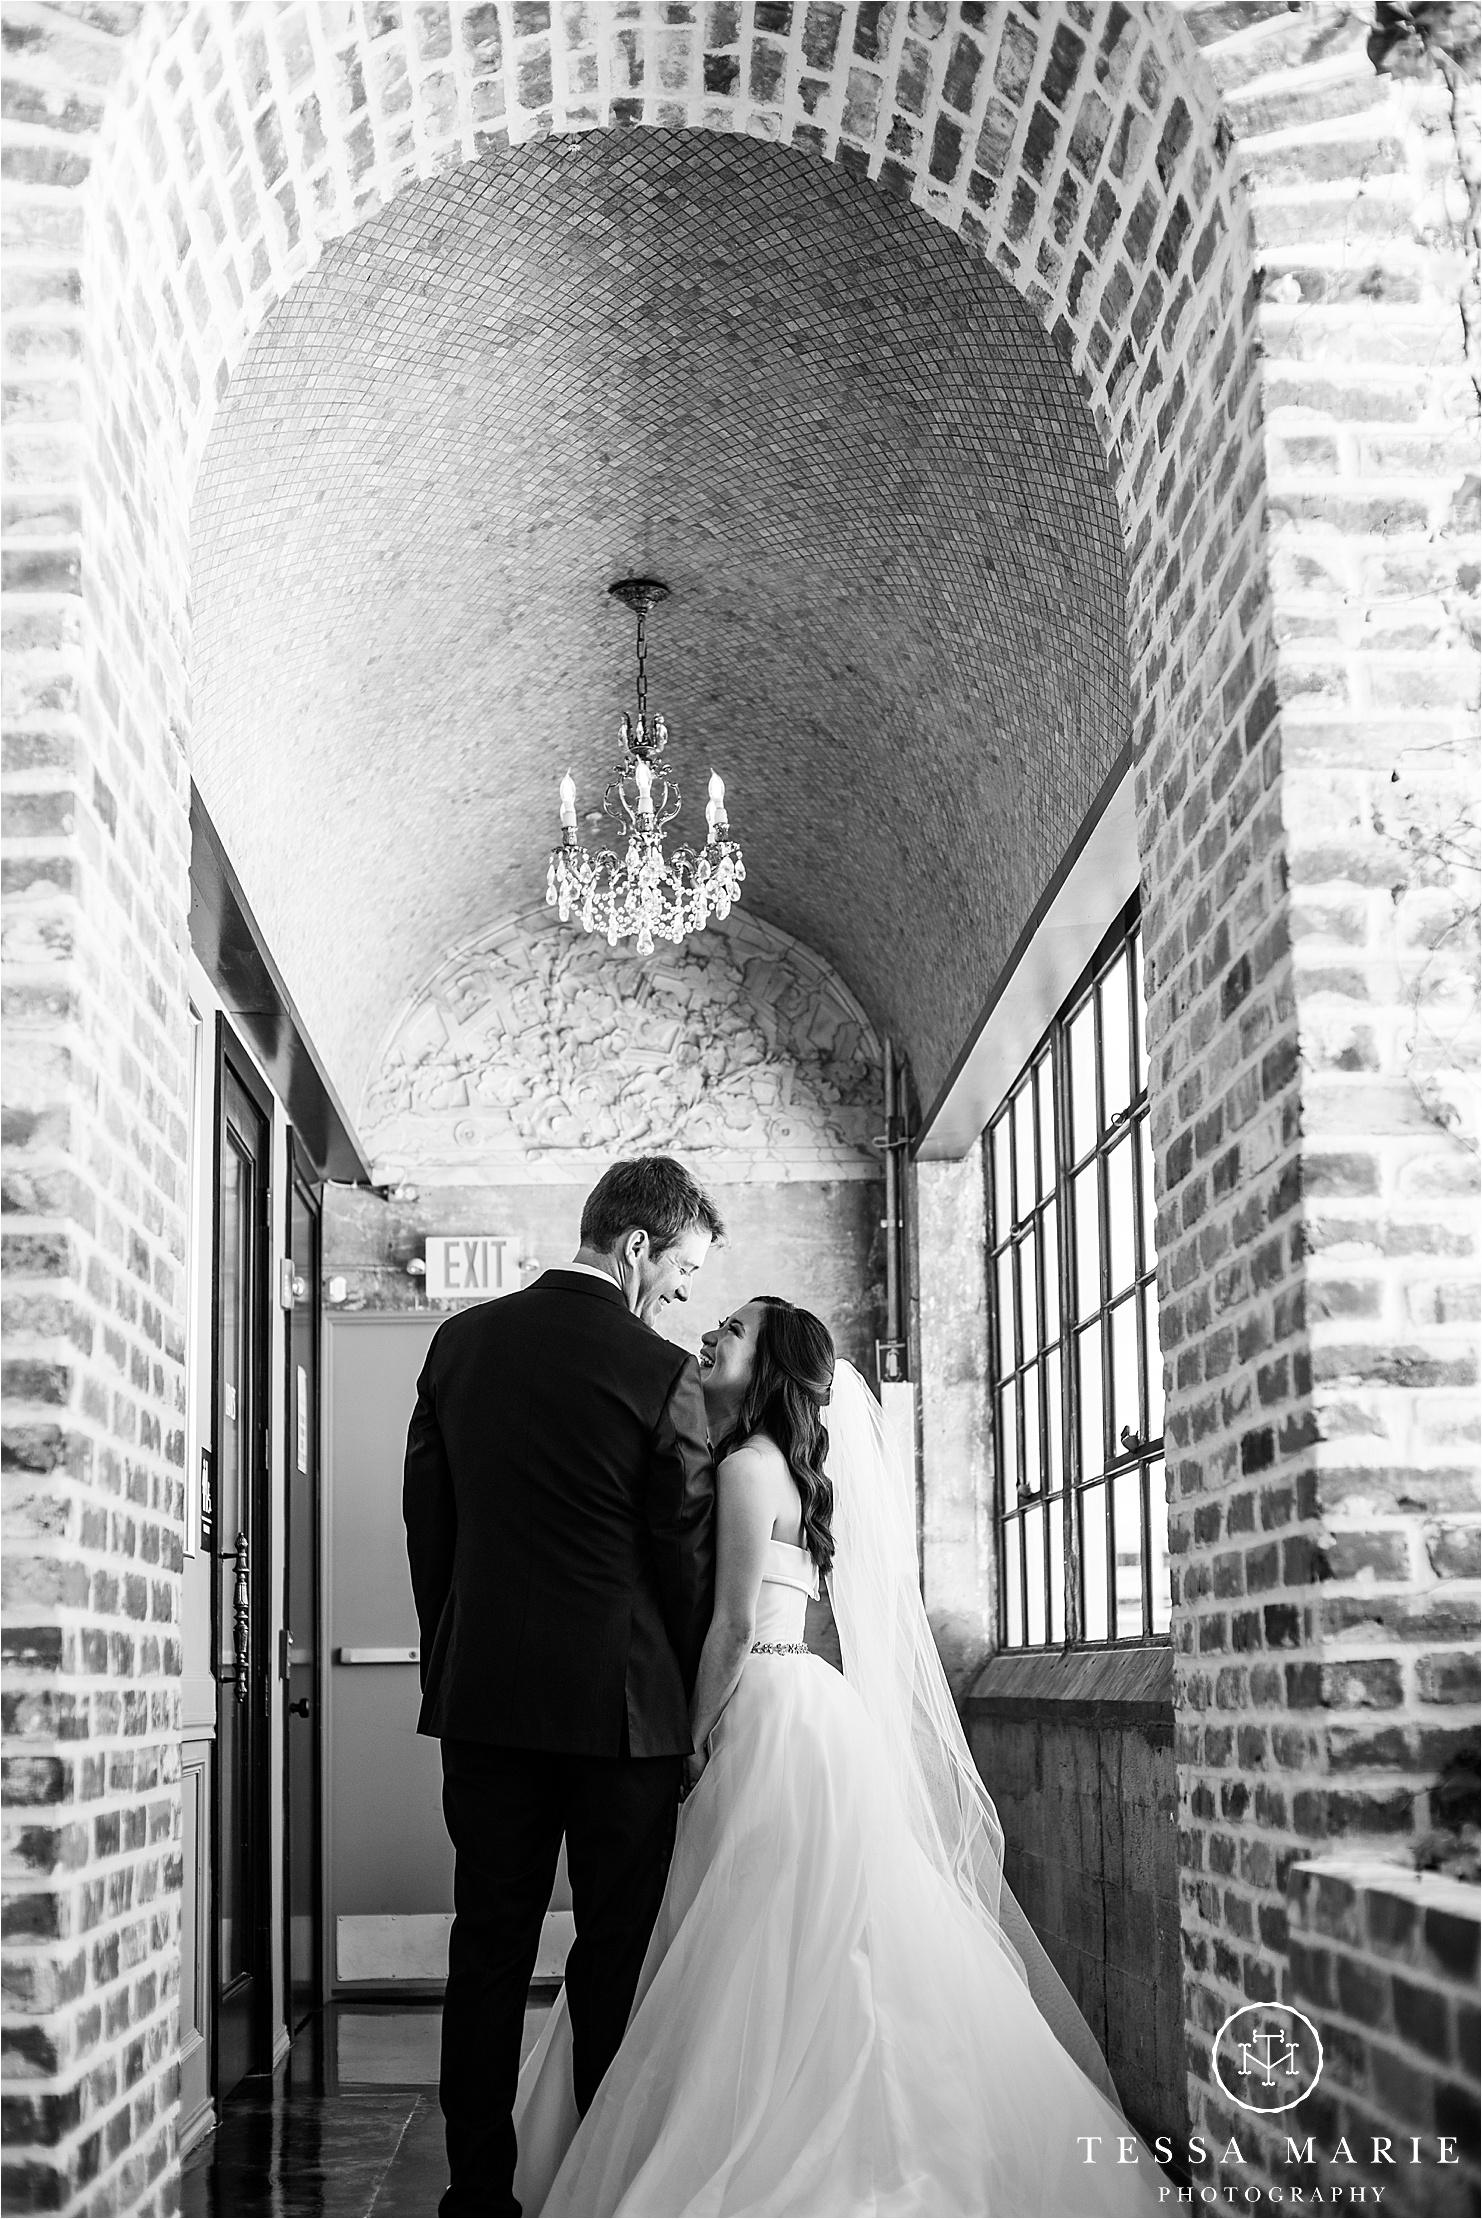 Tessa_marie_weddings_houston_wedding_photographer_The_astorian_0058.jpg